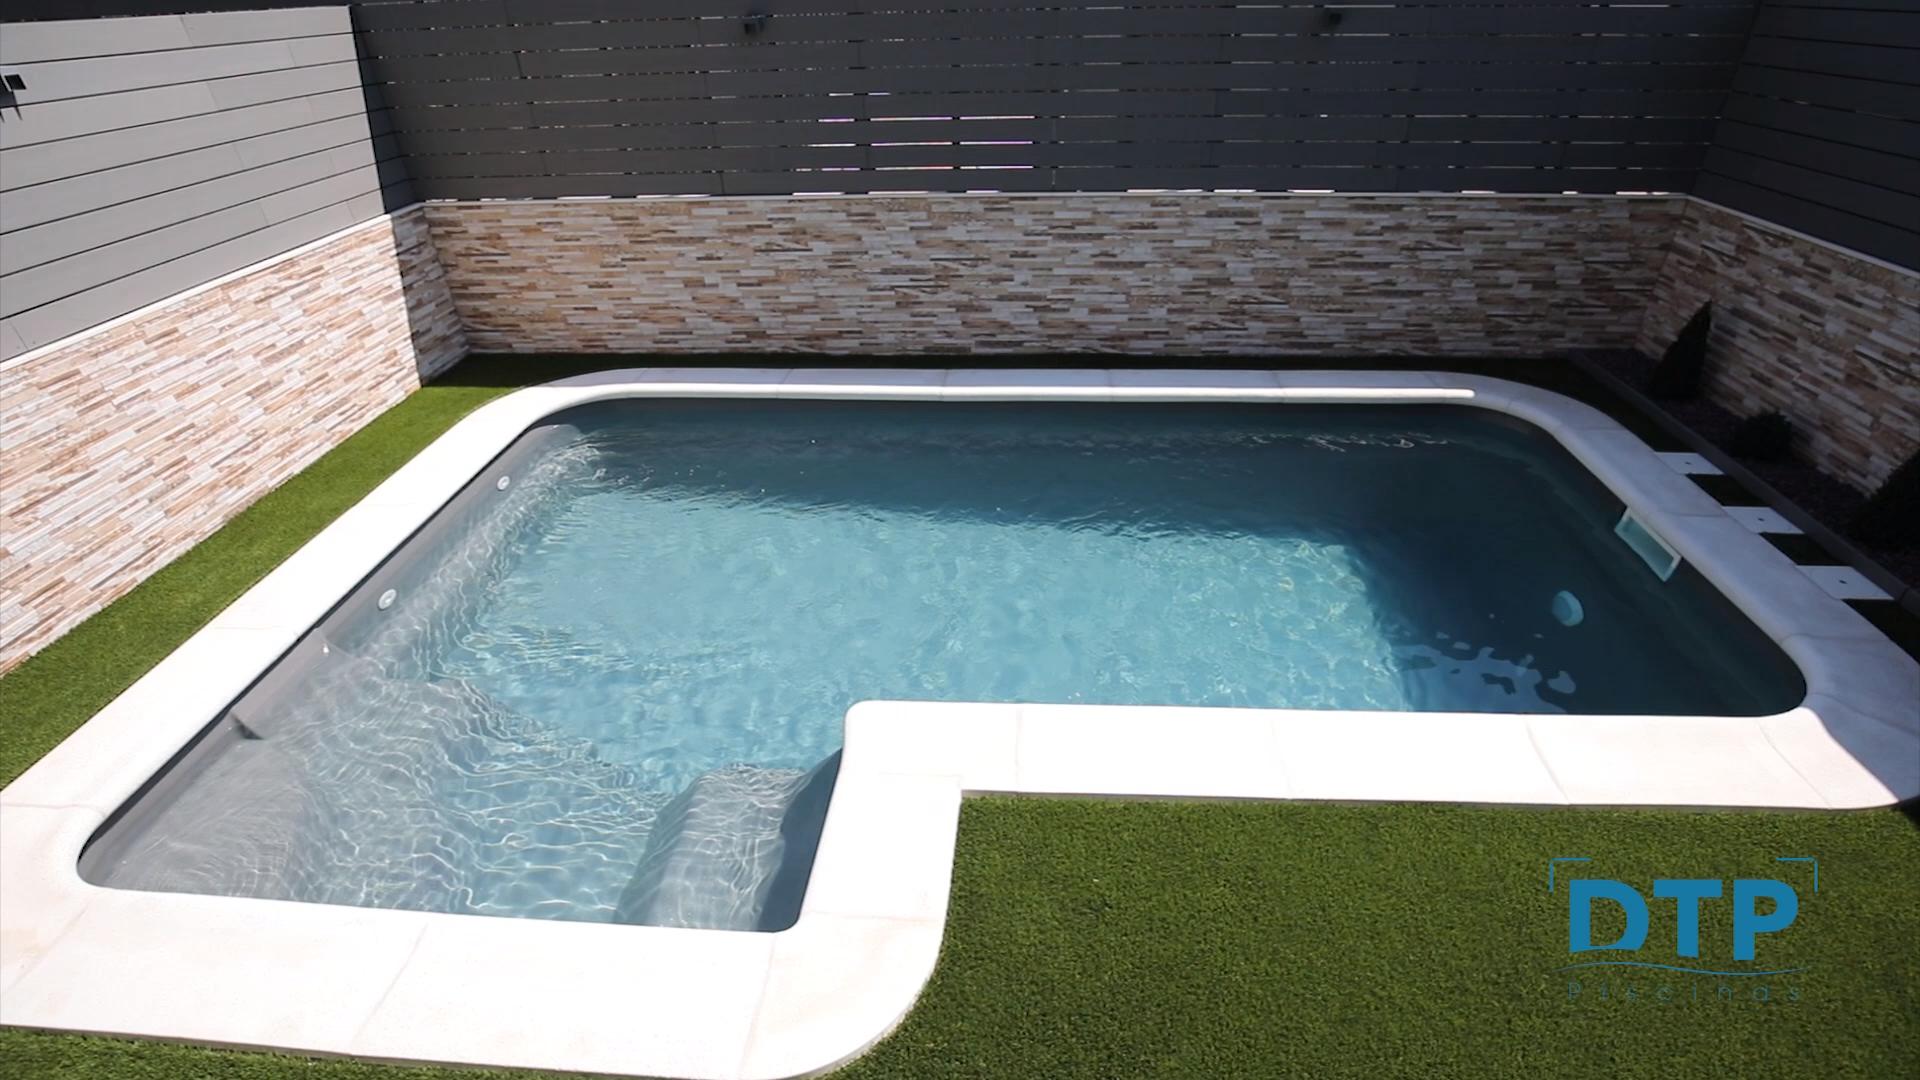 Construccin Piscinas De Poliester Formentera Spa In 2020 Diy Swimming Pool Backyard Pool Backyard Pool Landscaping